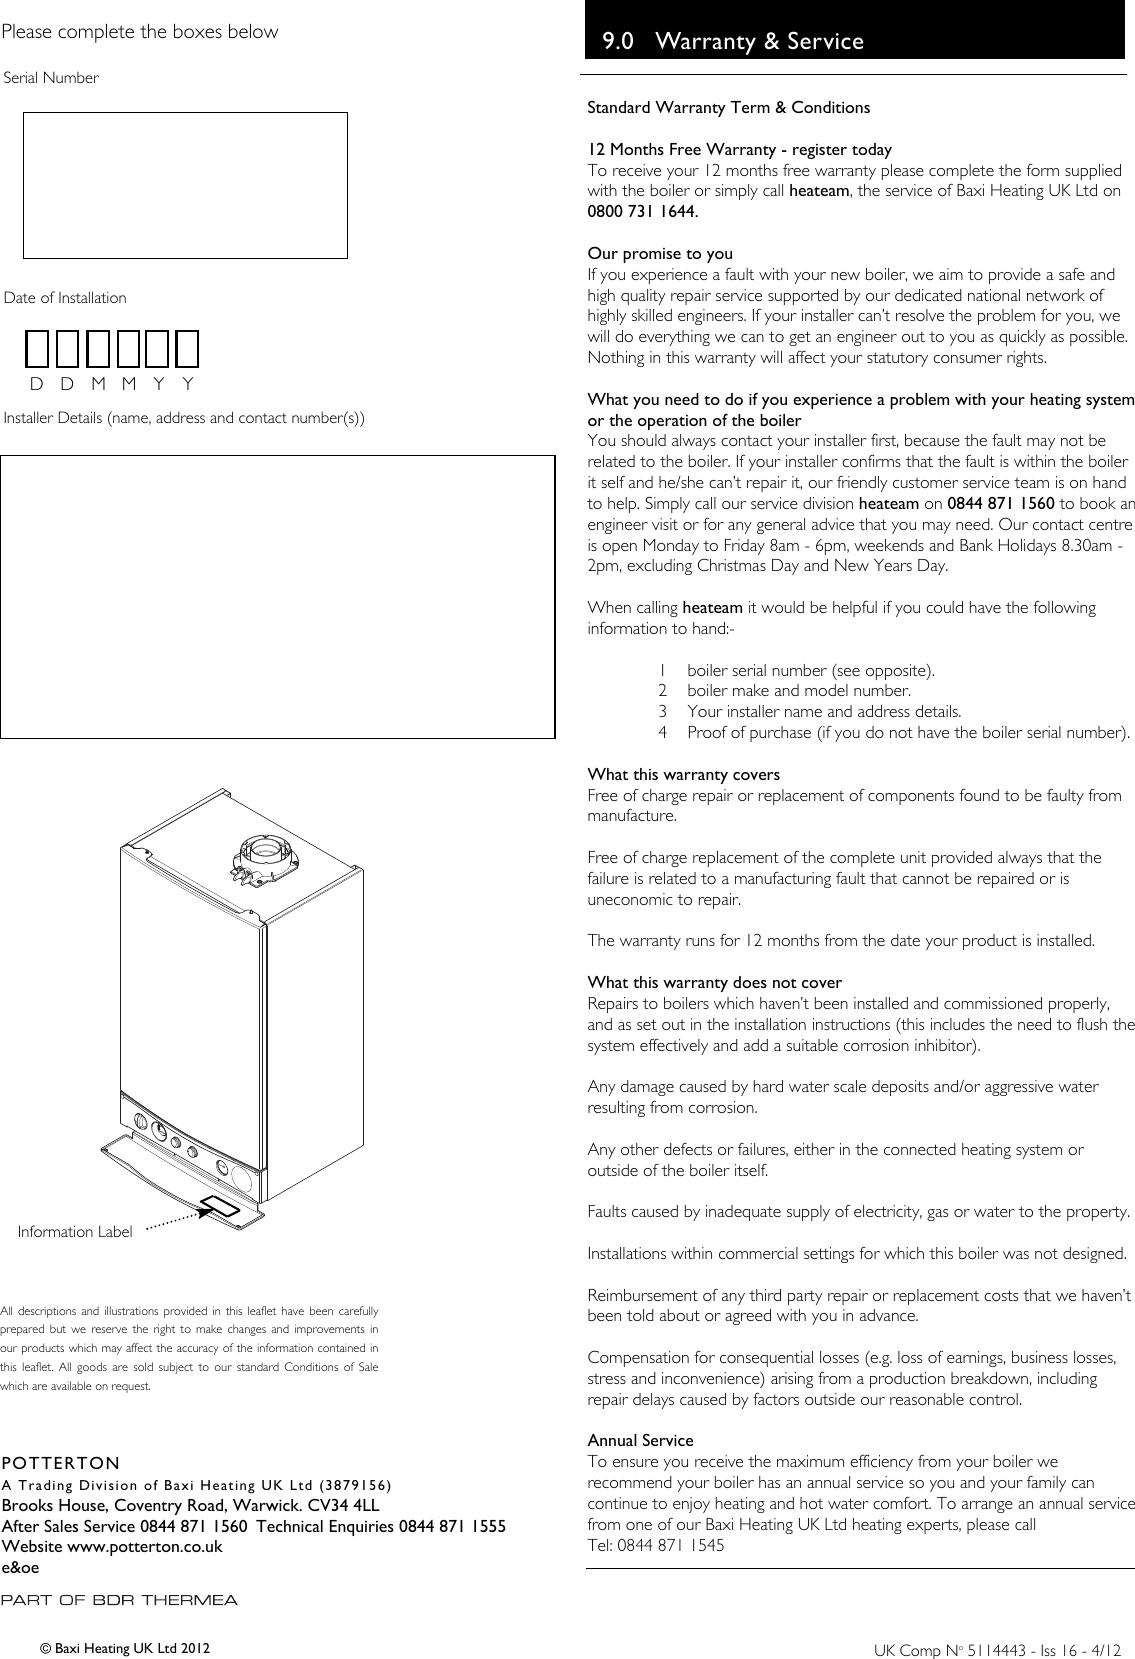 Baxi potterton promax combi 24 he plus a users manual 5114443 user page 12 of 12 baxi potterton baxi potterton promax combi cheapraybanclubmaster Choice Image